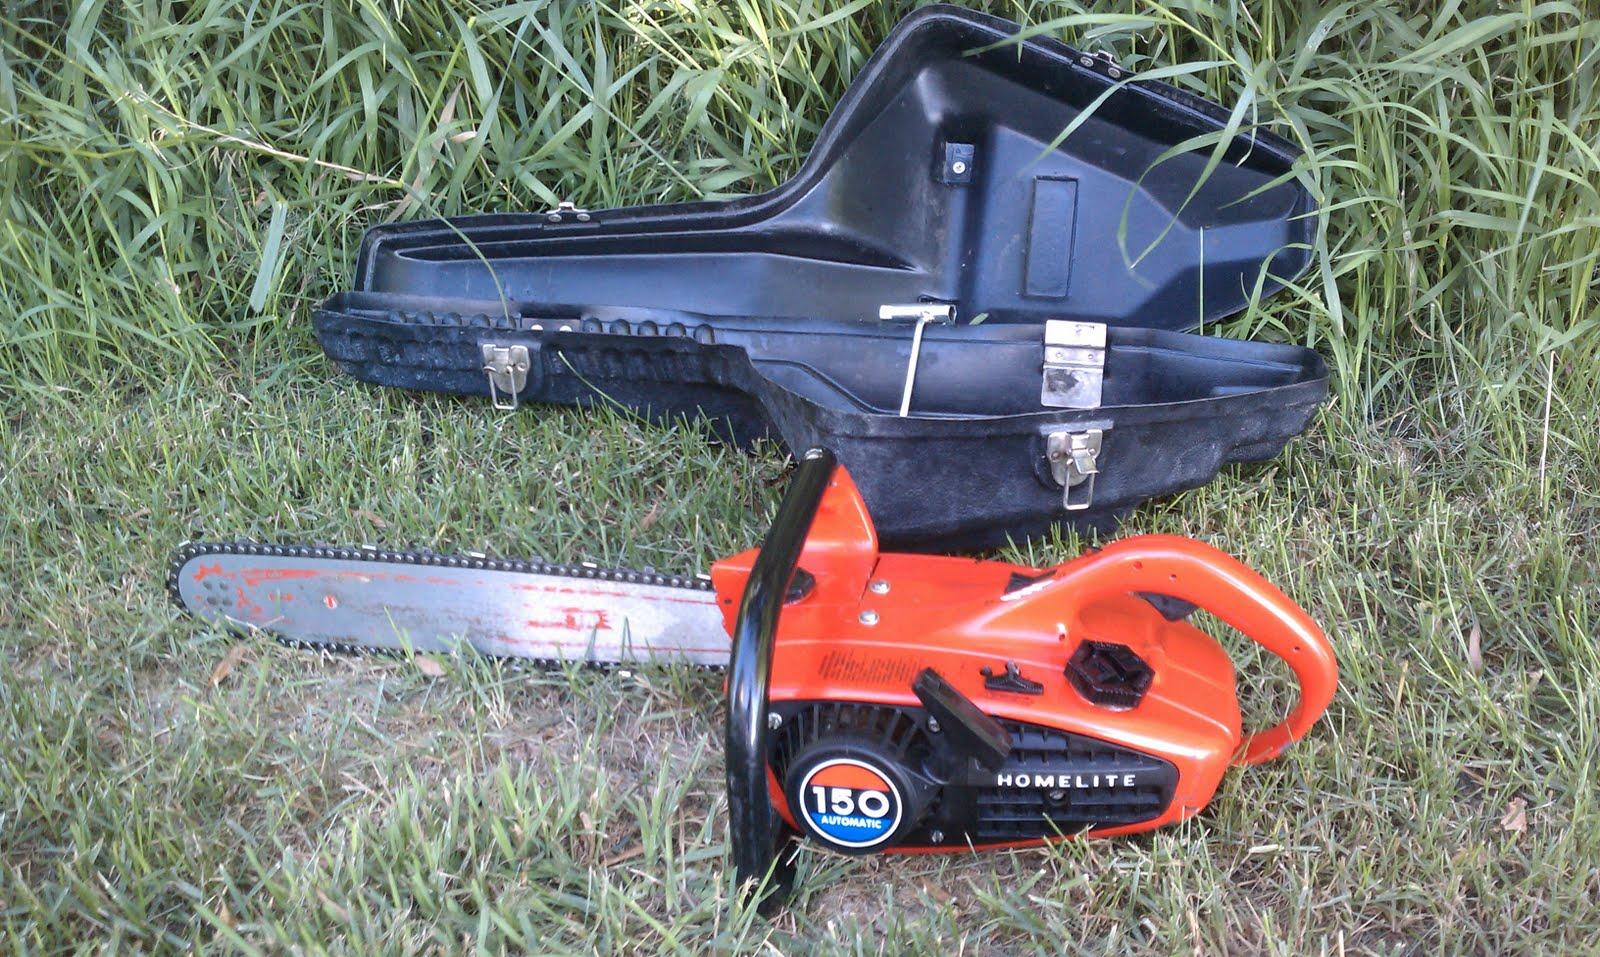 Homelite Textron Chainsaw Manual 10655